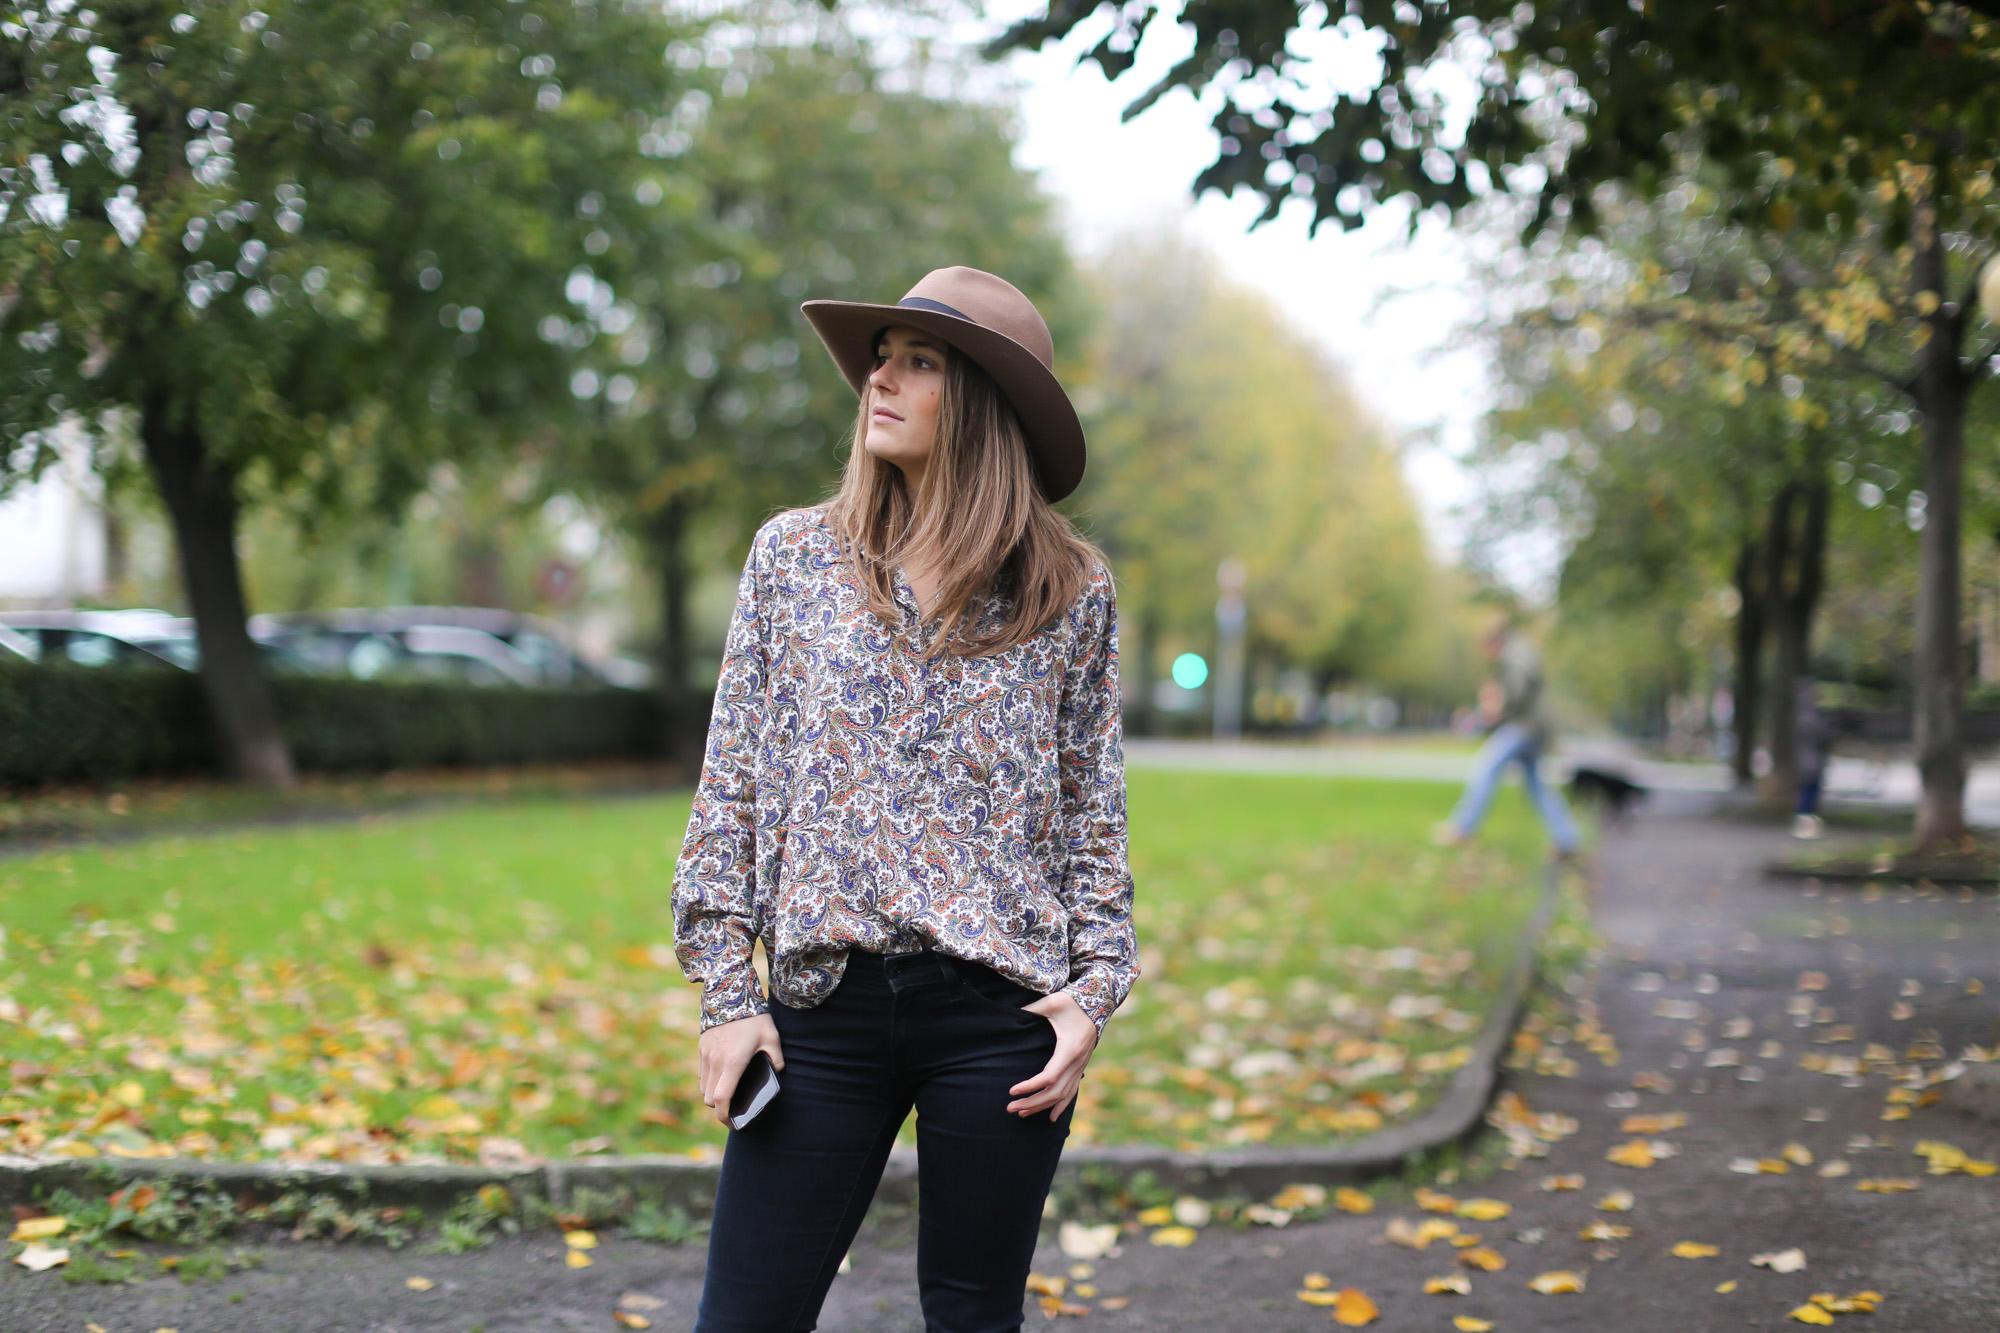 Clochet-streetstyle-fedora-hat-suiteblanco-paisley-shirt-cowboy-boots-7